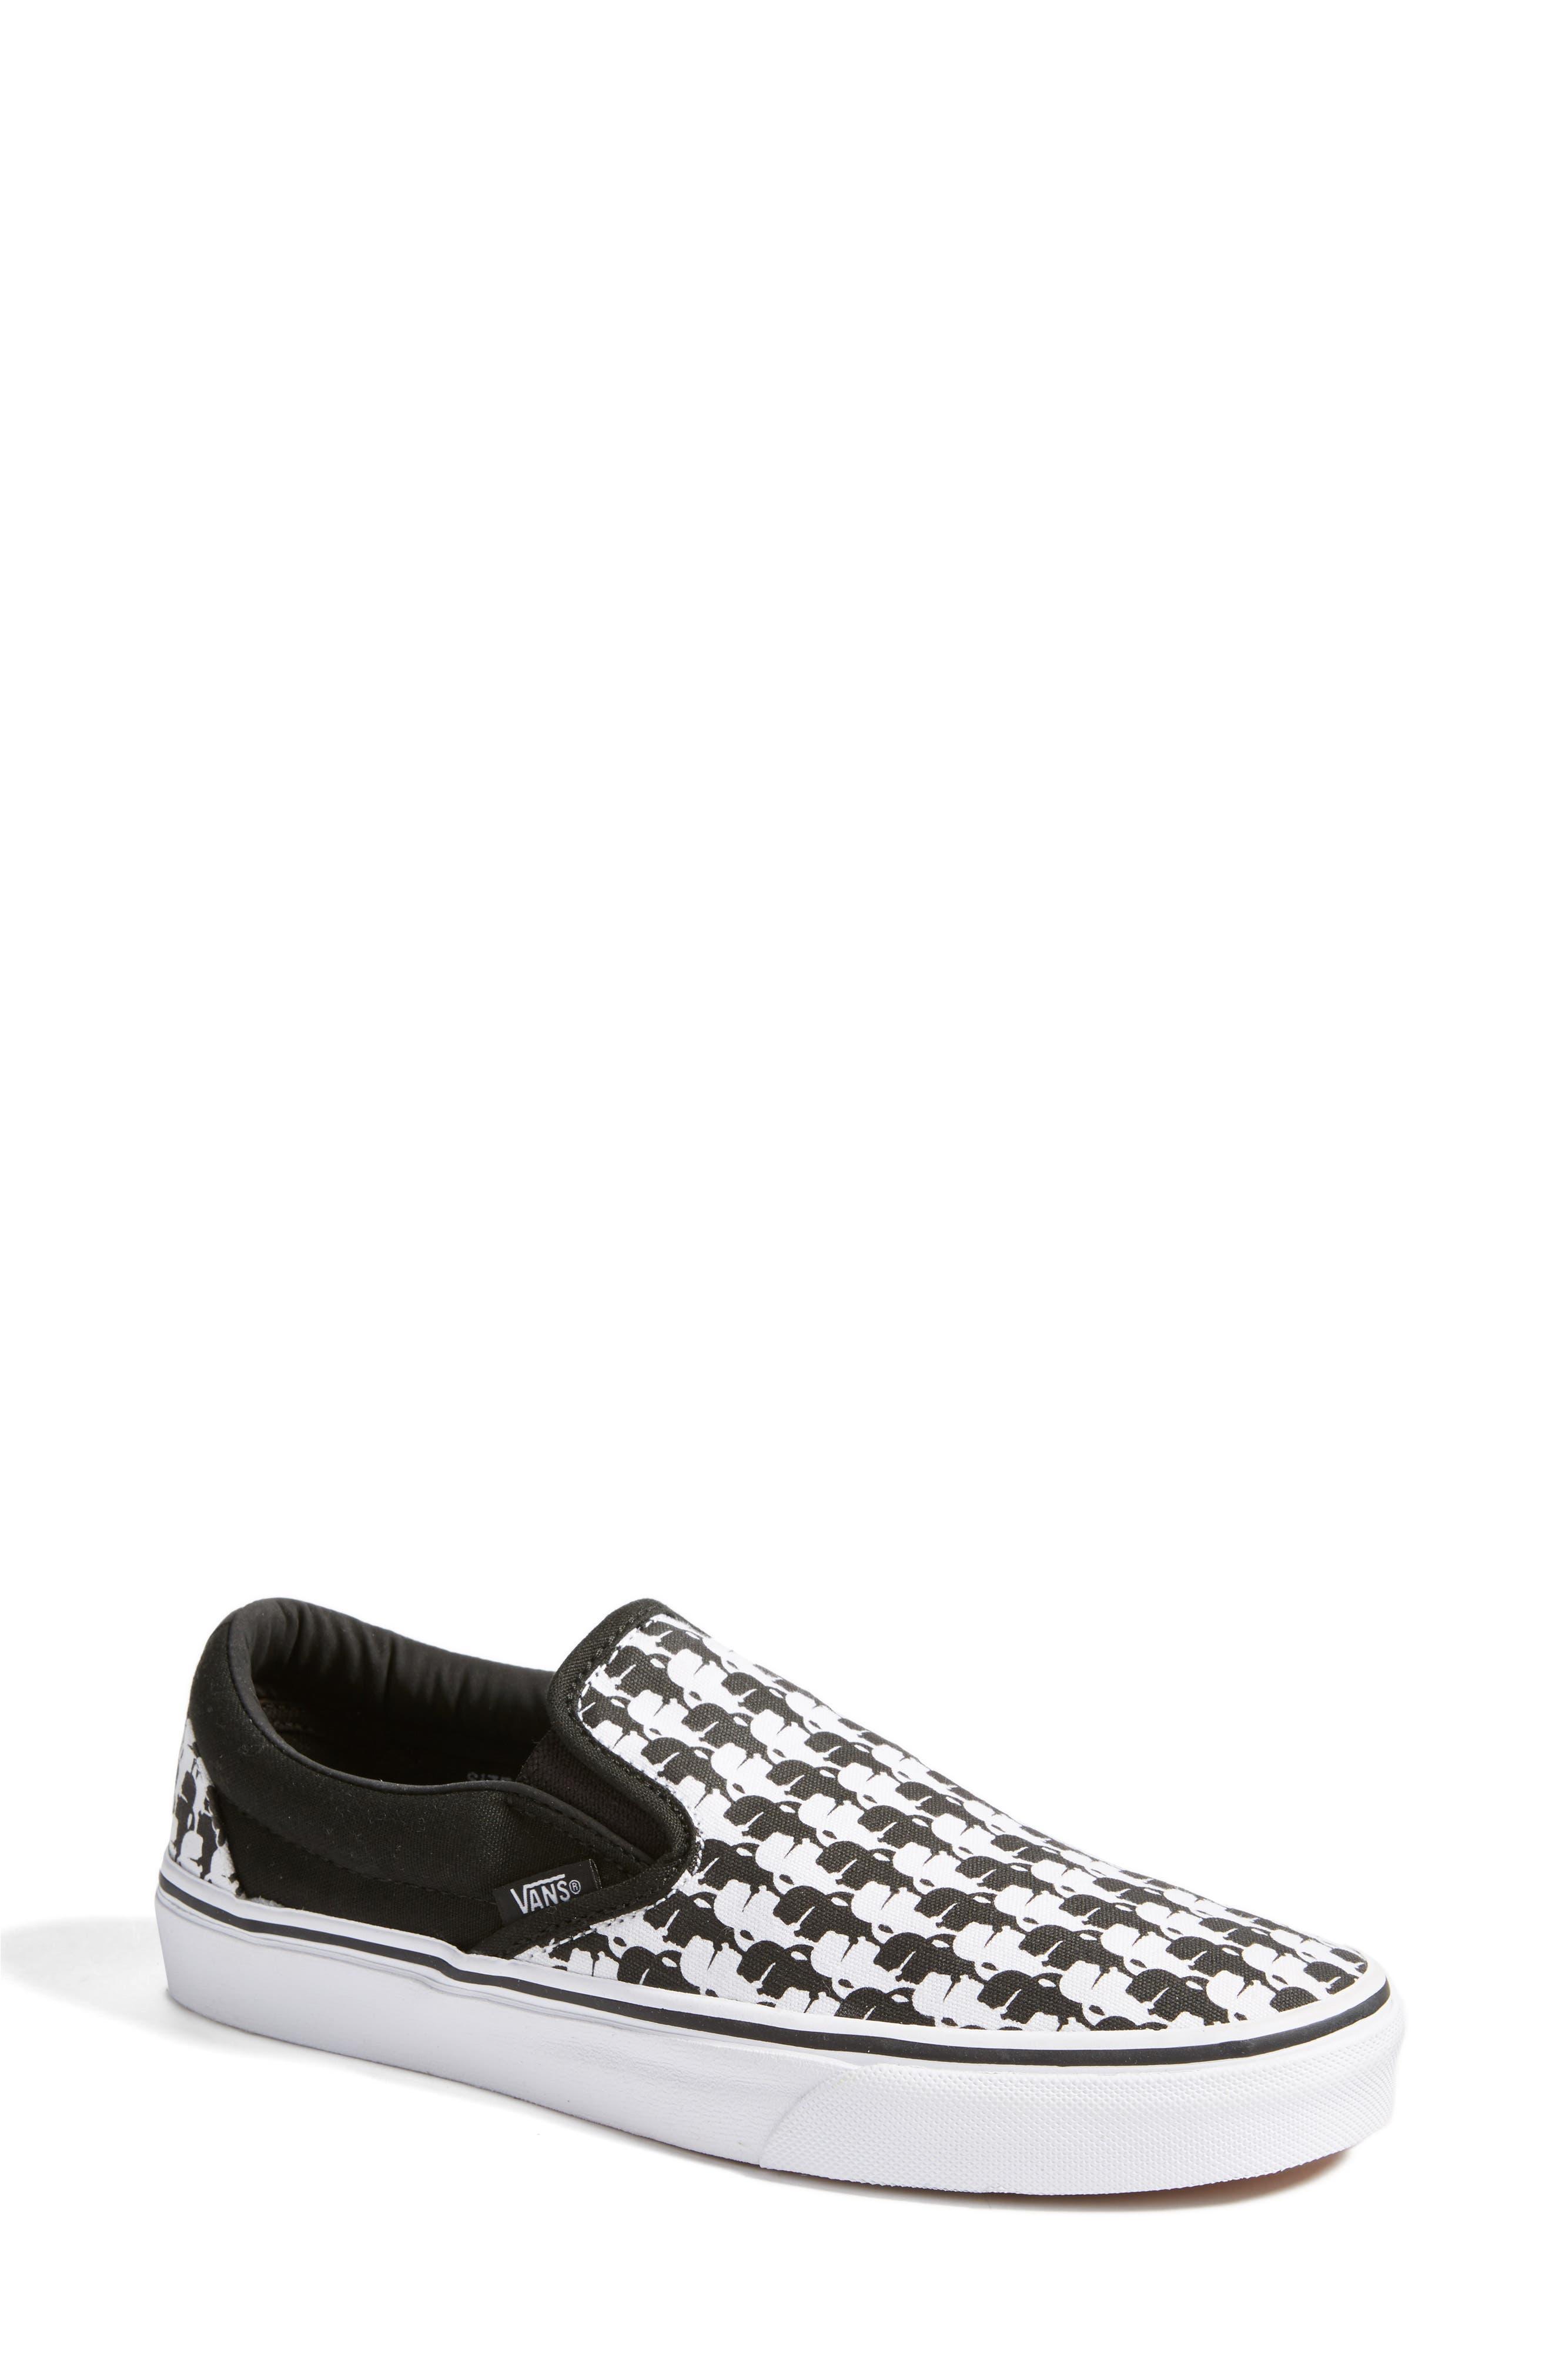 Main Image - Vans x KARL LAGERFELD Houndstooth Slip-On Sneaker (Women)